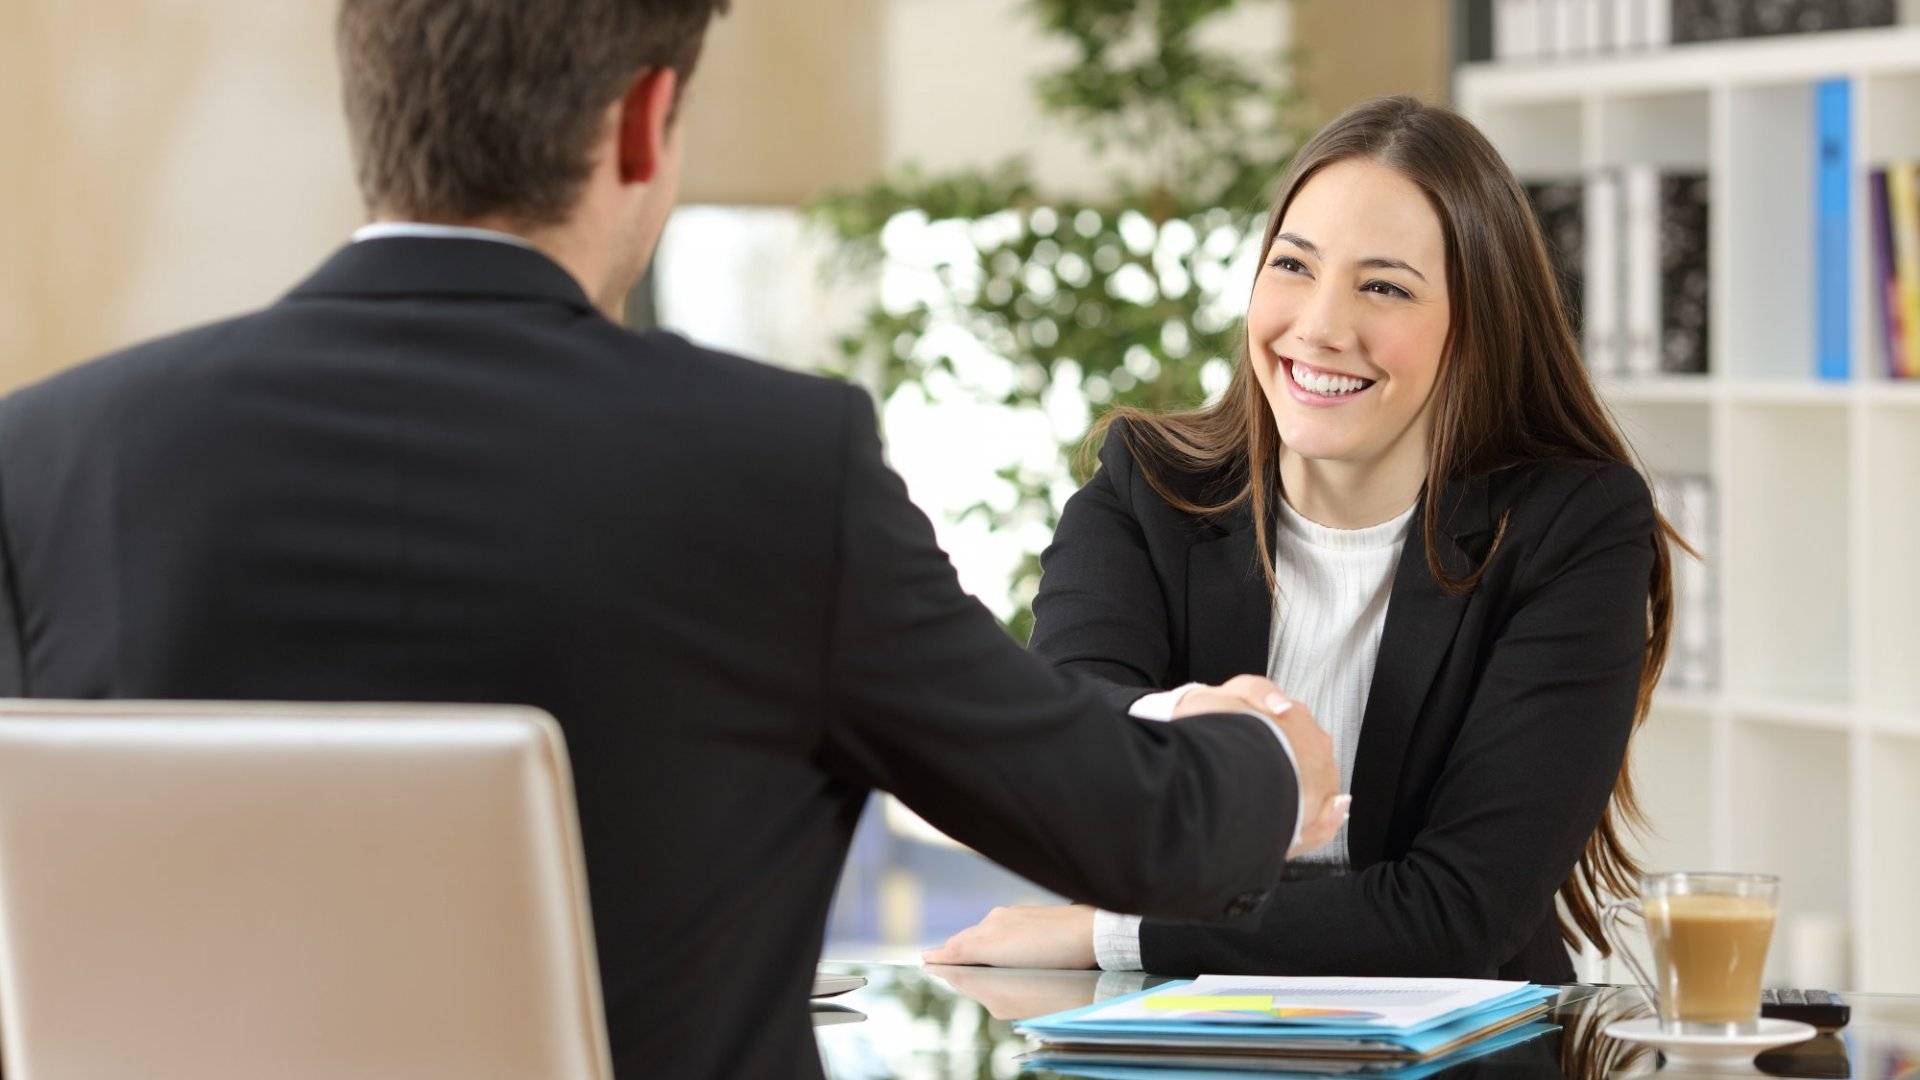 5 Ways to Close Your Next Big Sale